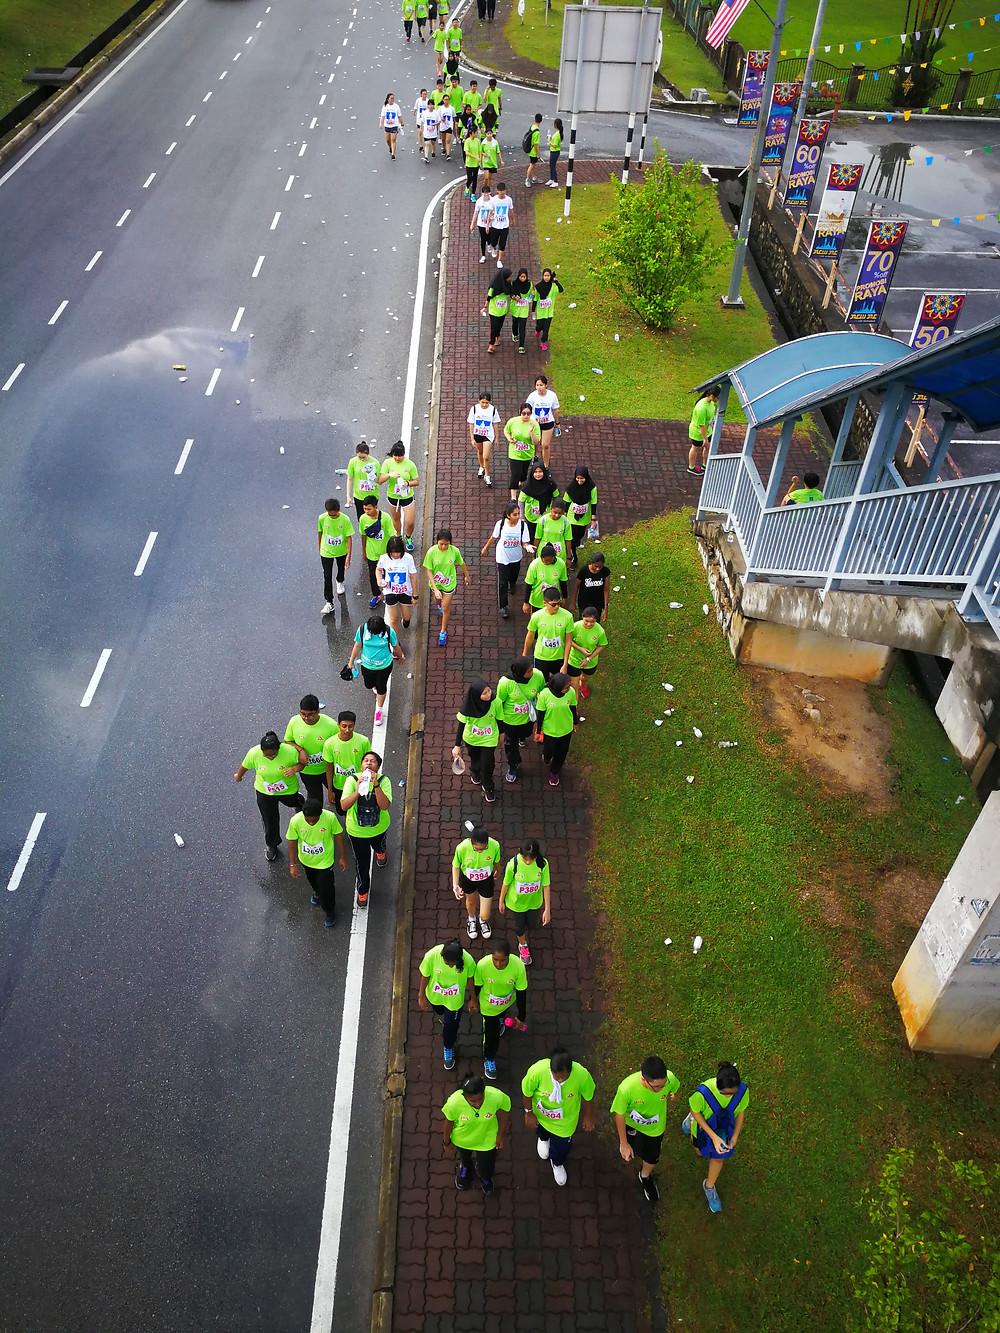 serembanonline photograph of the Seremban  Half Marathon 2017 taken by photographer Nic Falconer nicaliss